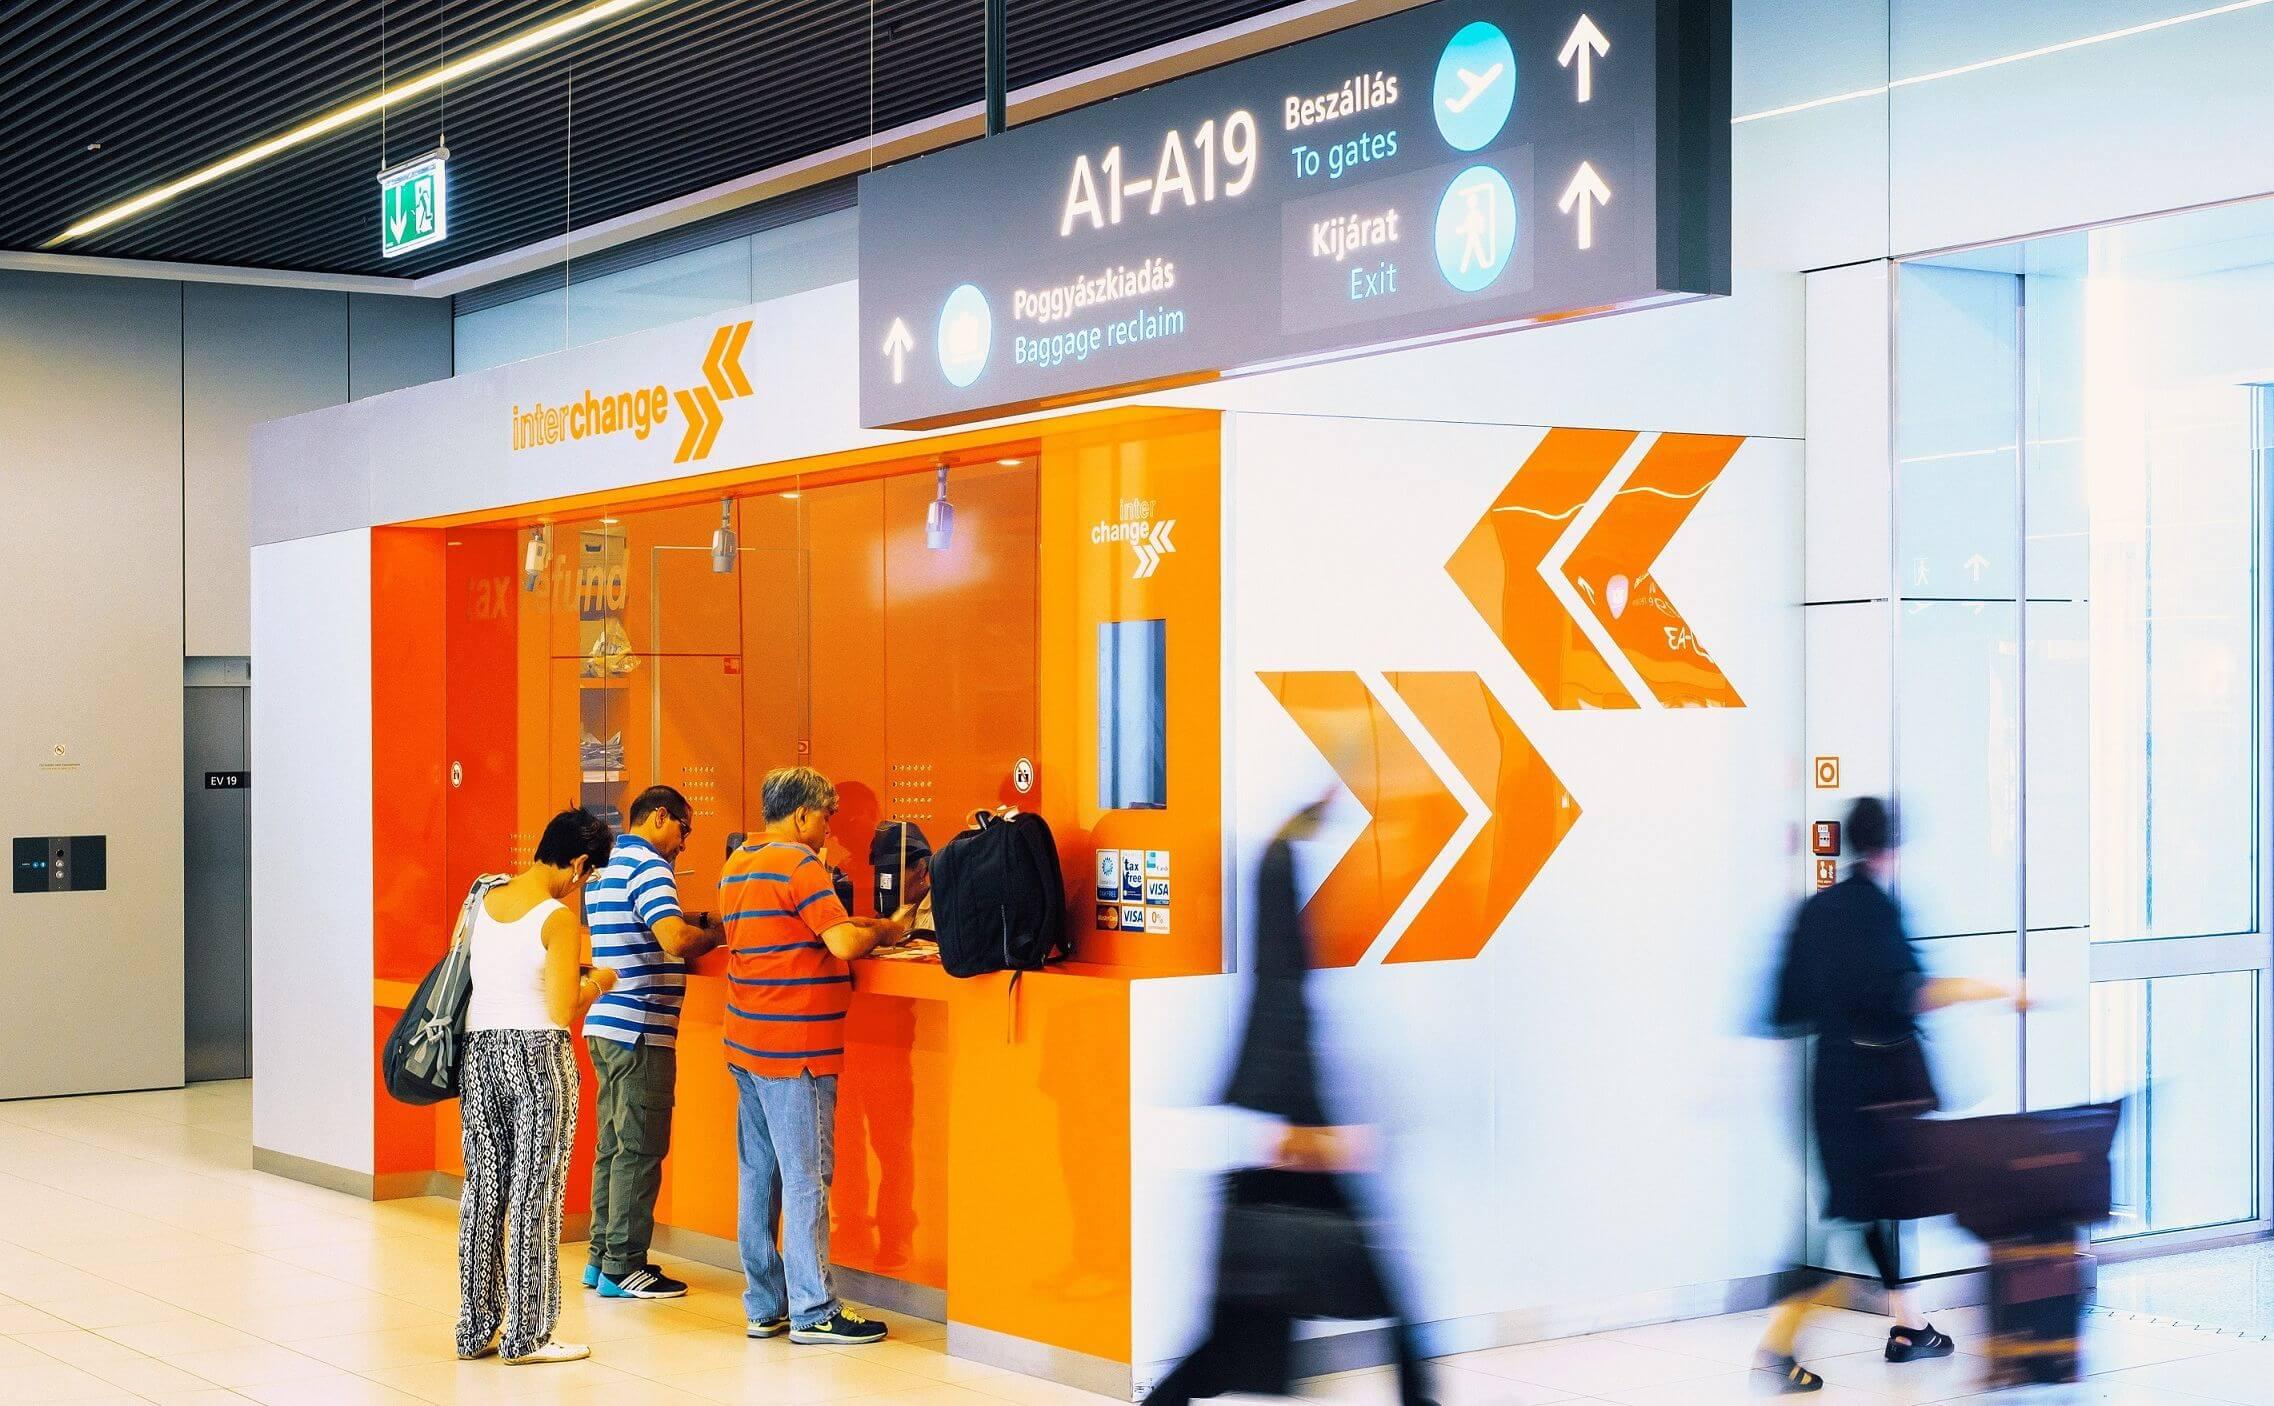 tax refund interchange Budapest Airport החזר מס בבודפשט דוכן אינטרצ'יינג'